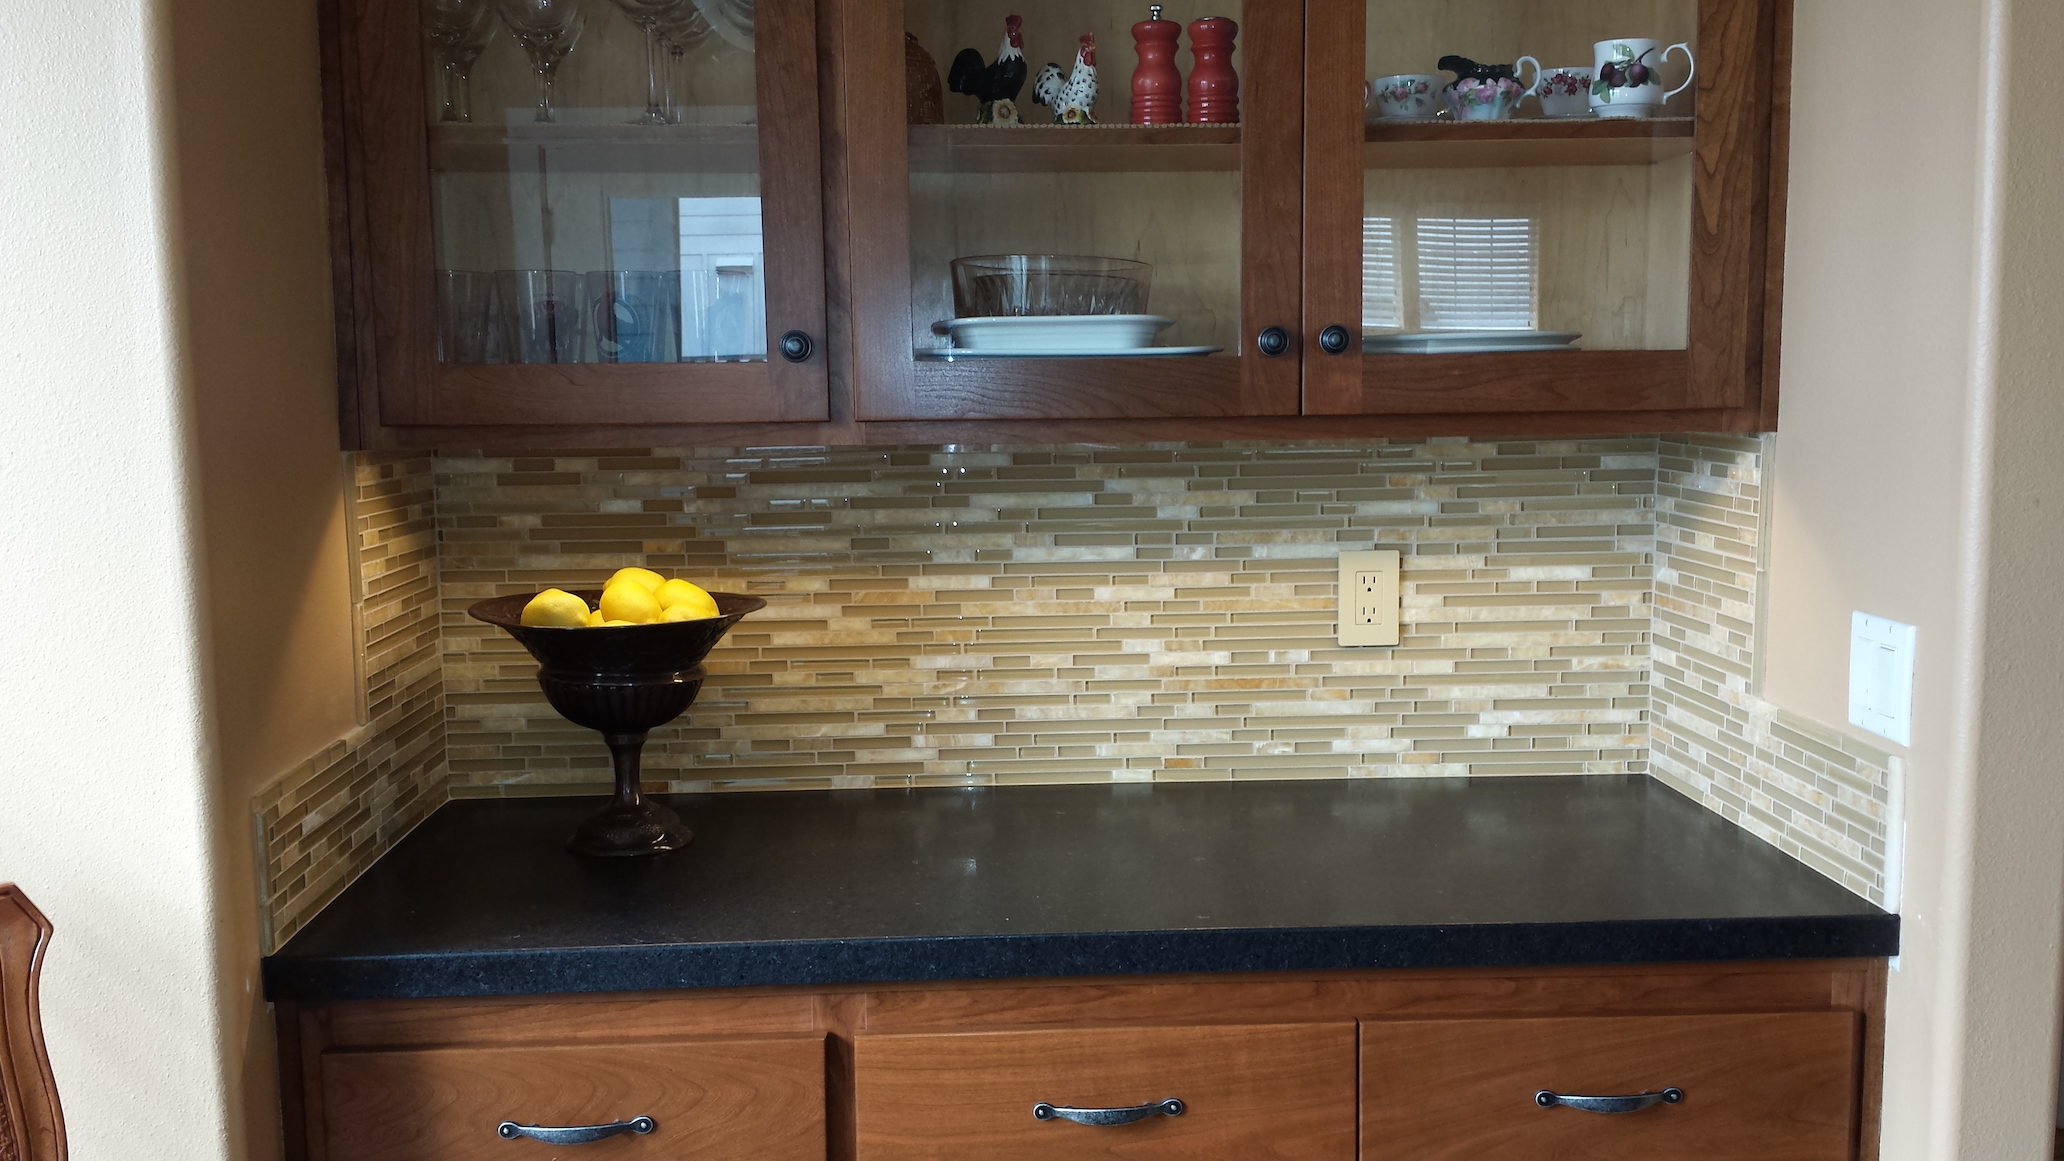 Kitchen Counter LED Lighting